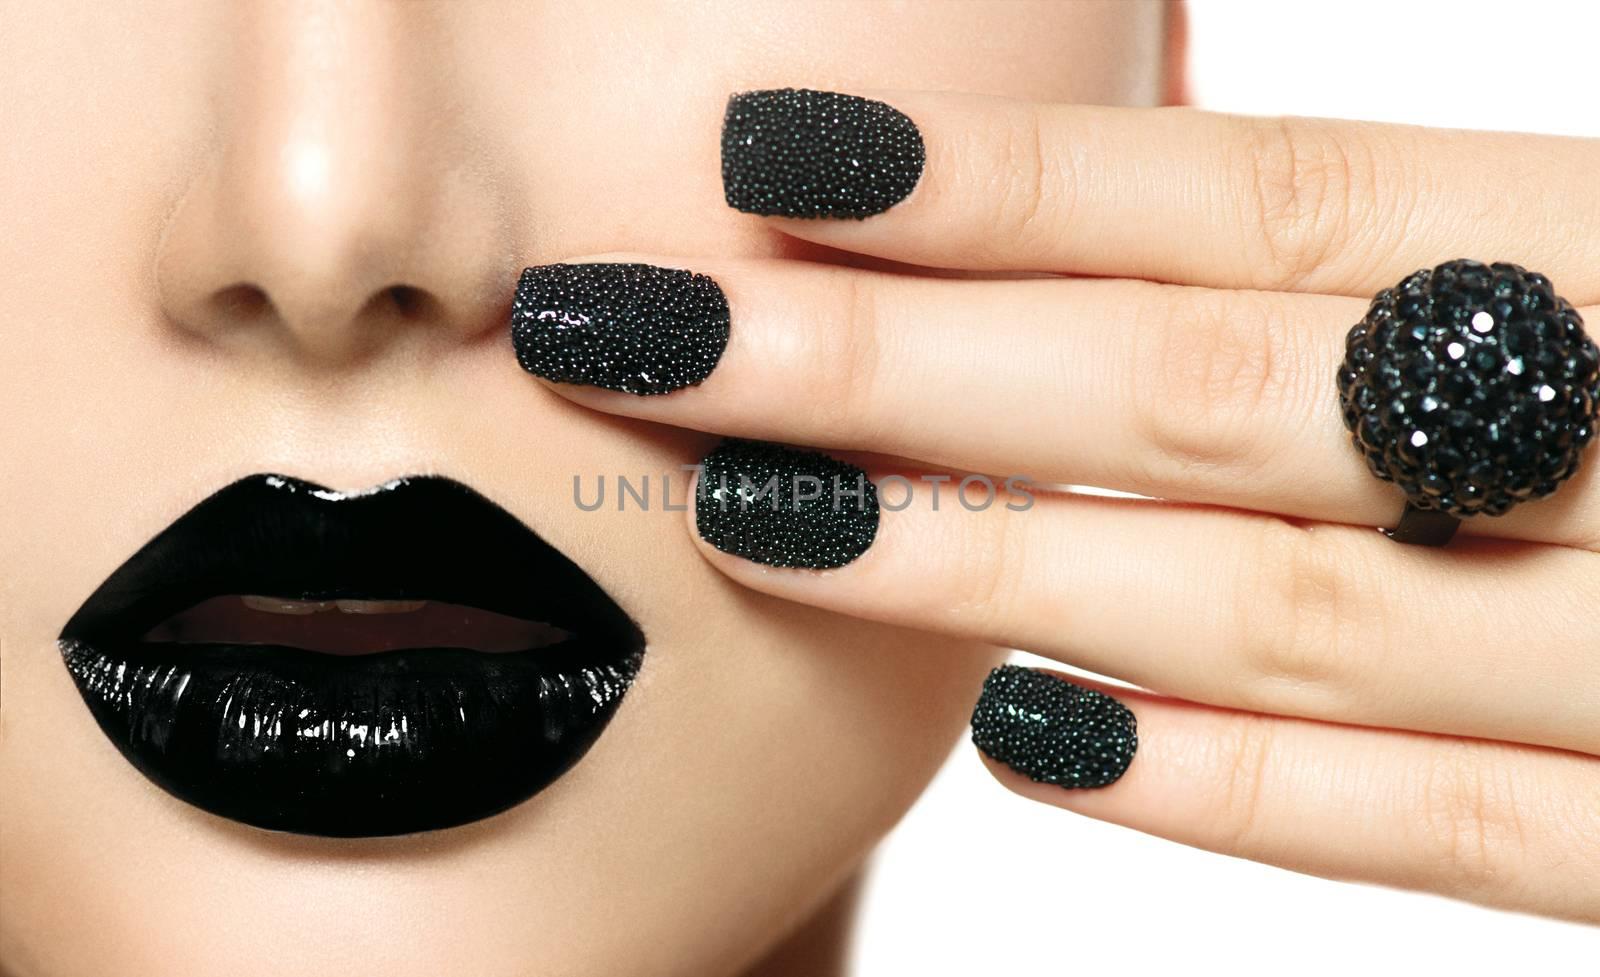 Black Caviar Manicure and Black Lips. Fashion Makeup